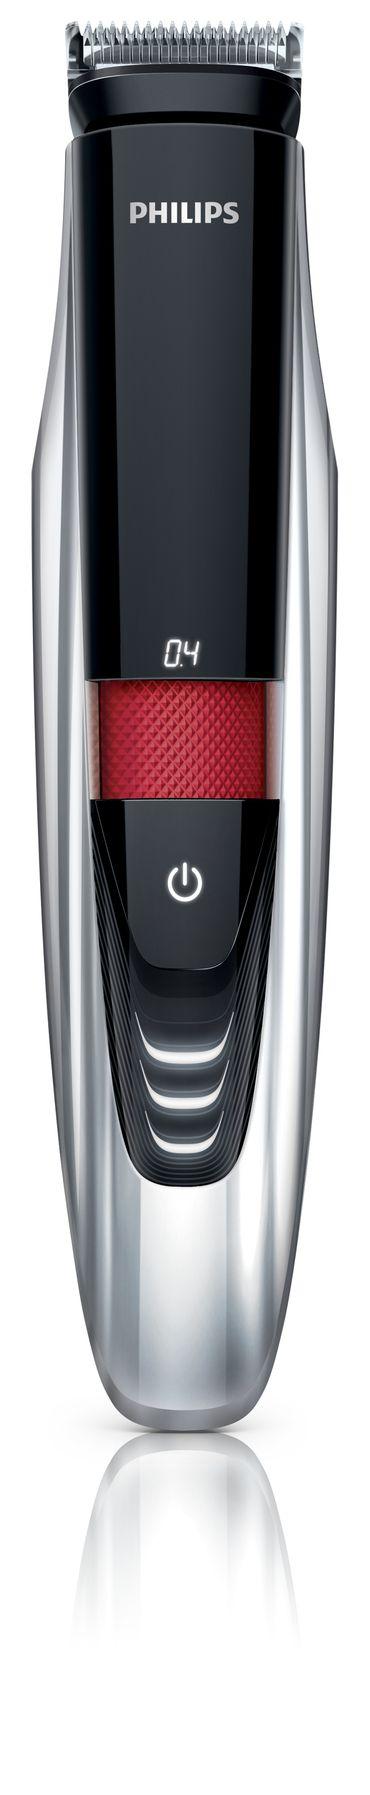 Beardtrimmer series 9000 Tondeuse barbe étanche